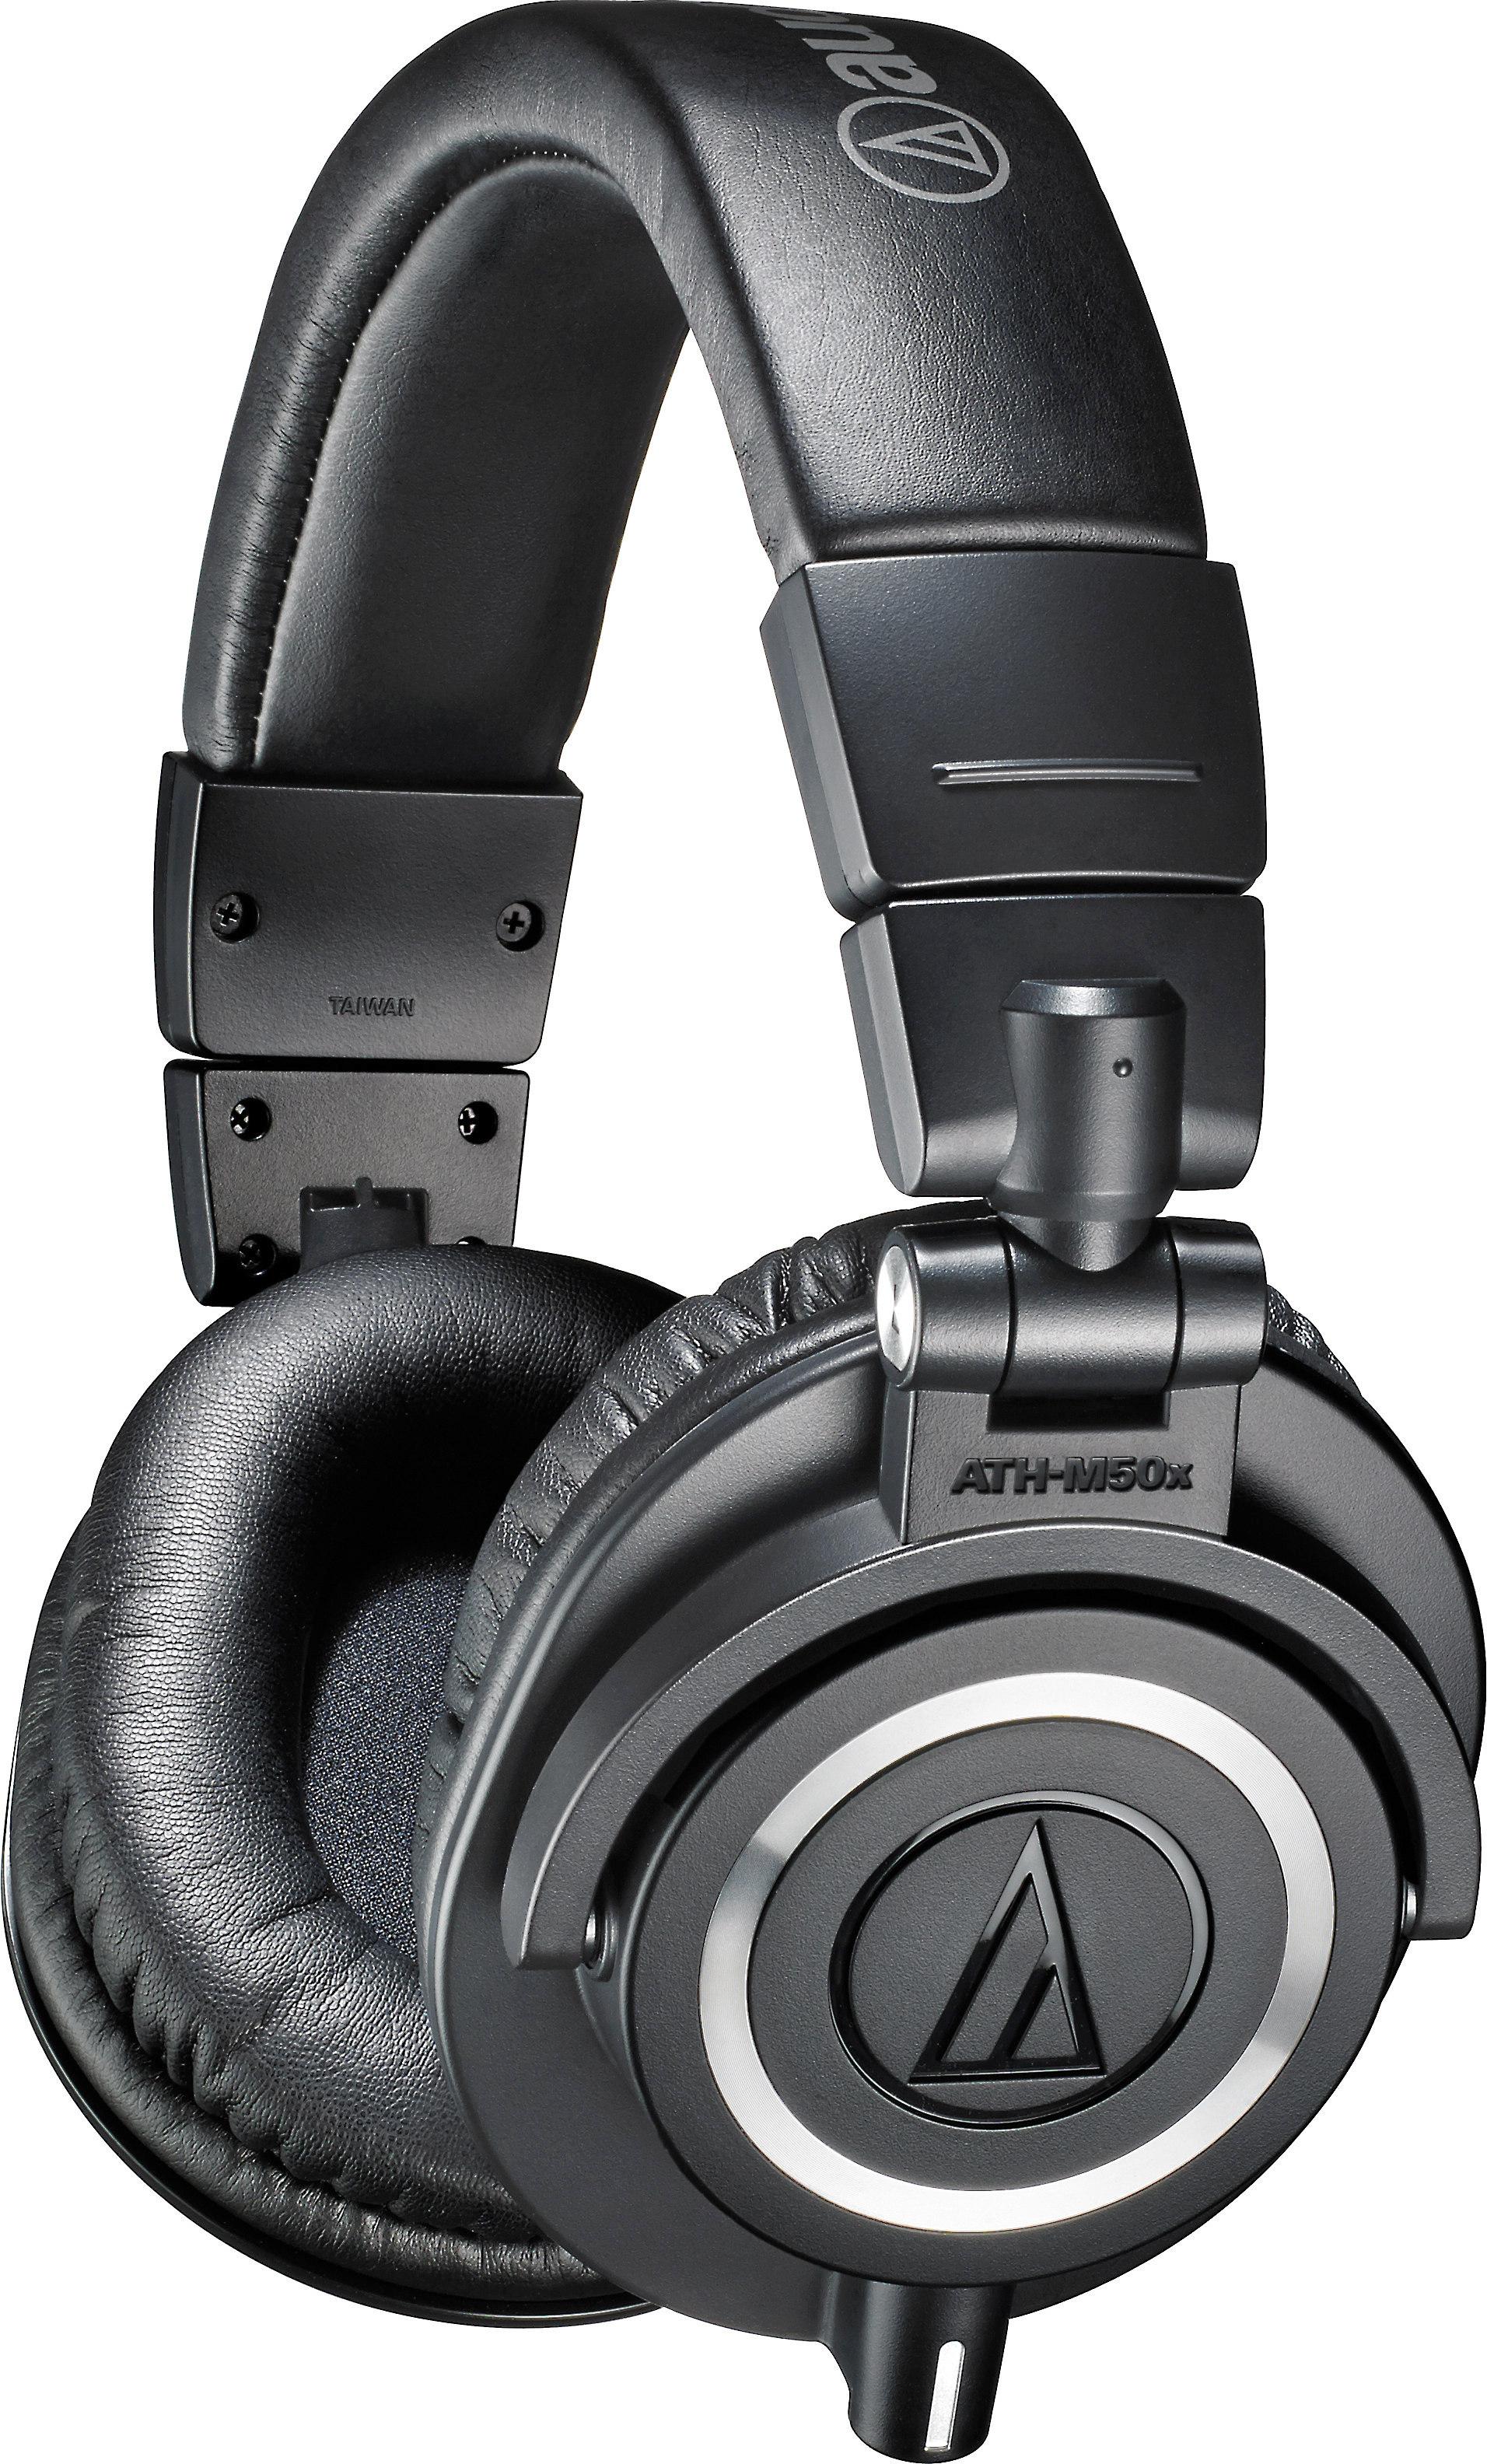 96d3056116a Audiophile Headphones at Crutchfield